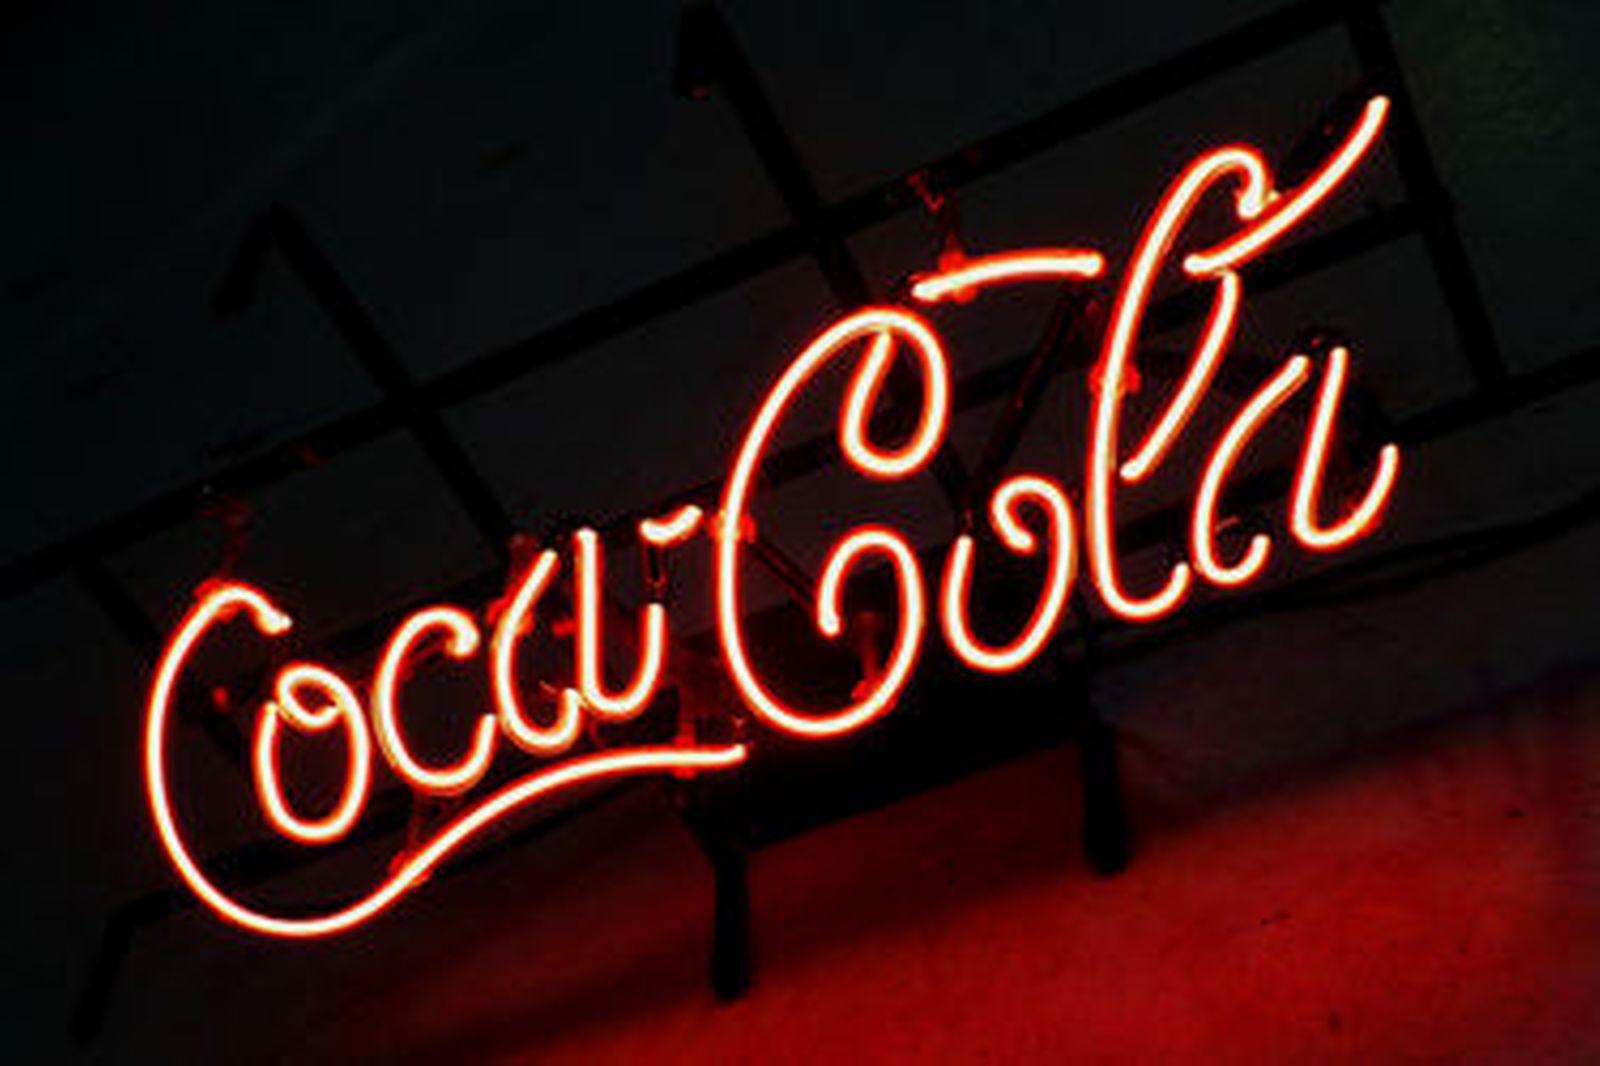 3 x Coca-Cola Eskys, 1 X Neon Light & Enamel Sign